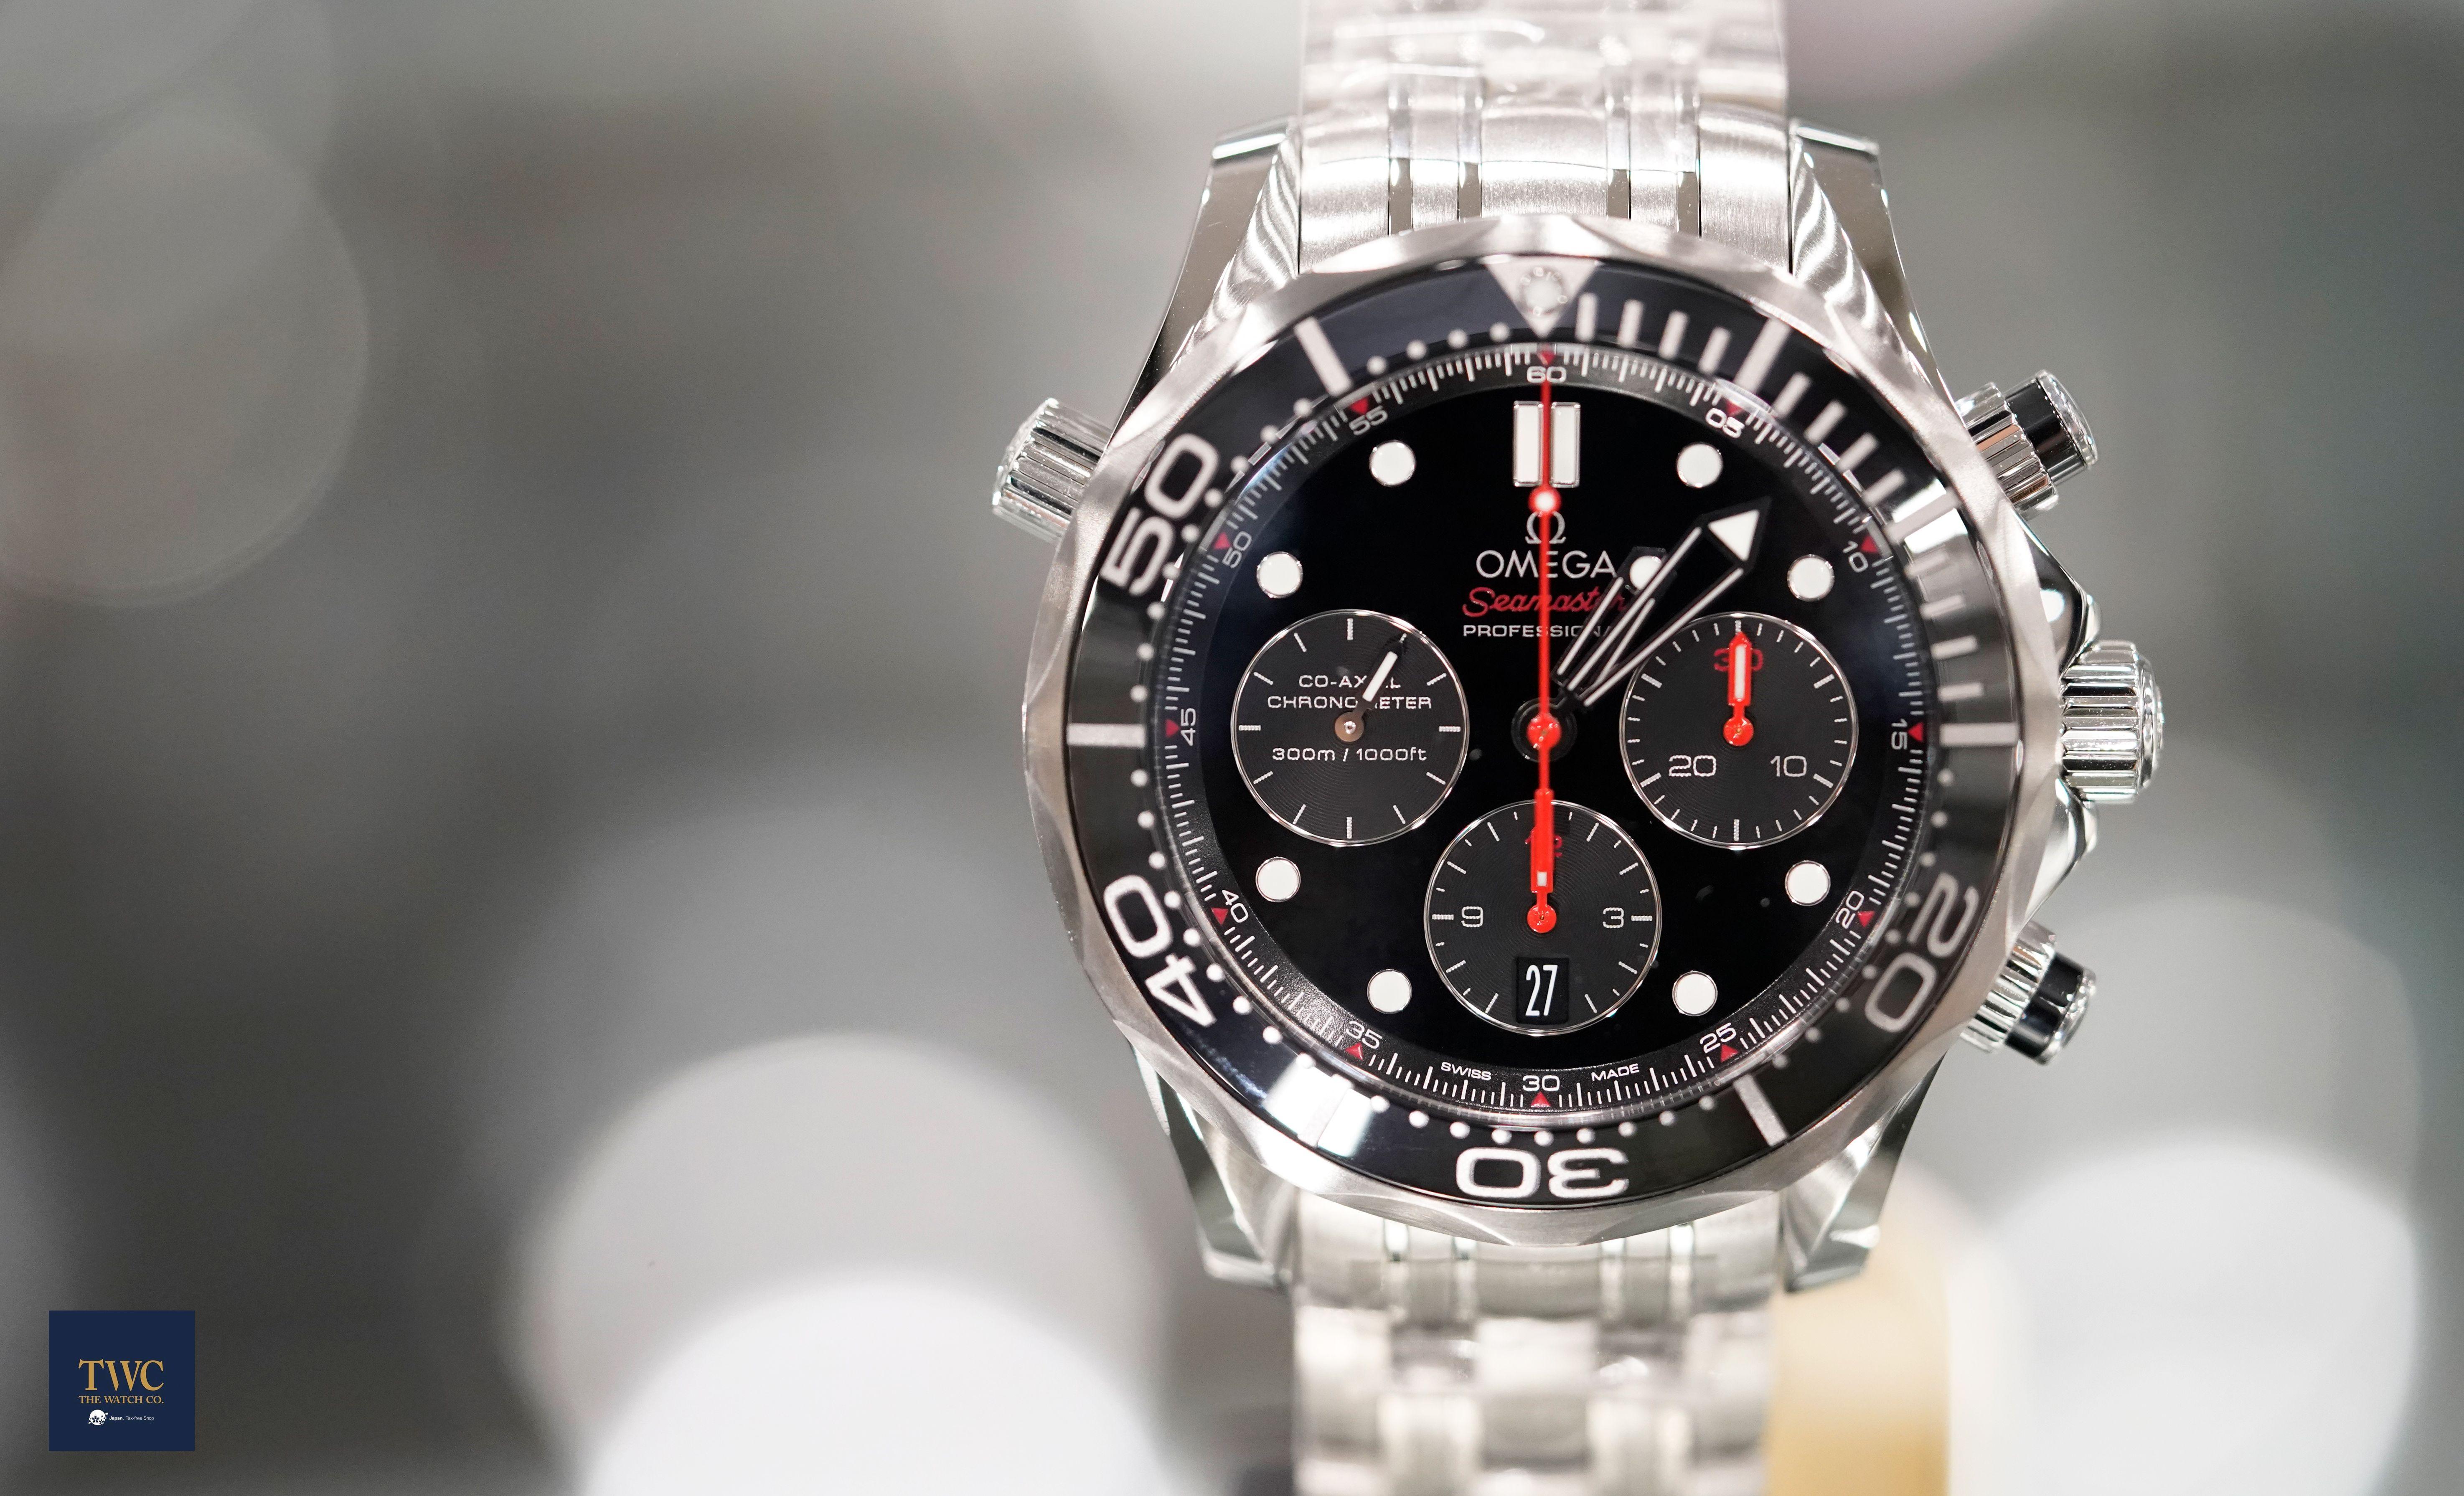 665ebb45c Reference 212.30.44.50.01.001 Omega Seamaster Seamaster Diver 300m  Chronograph Black Steel 44mm